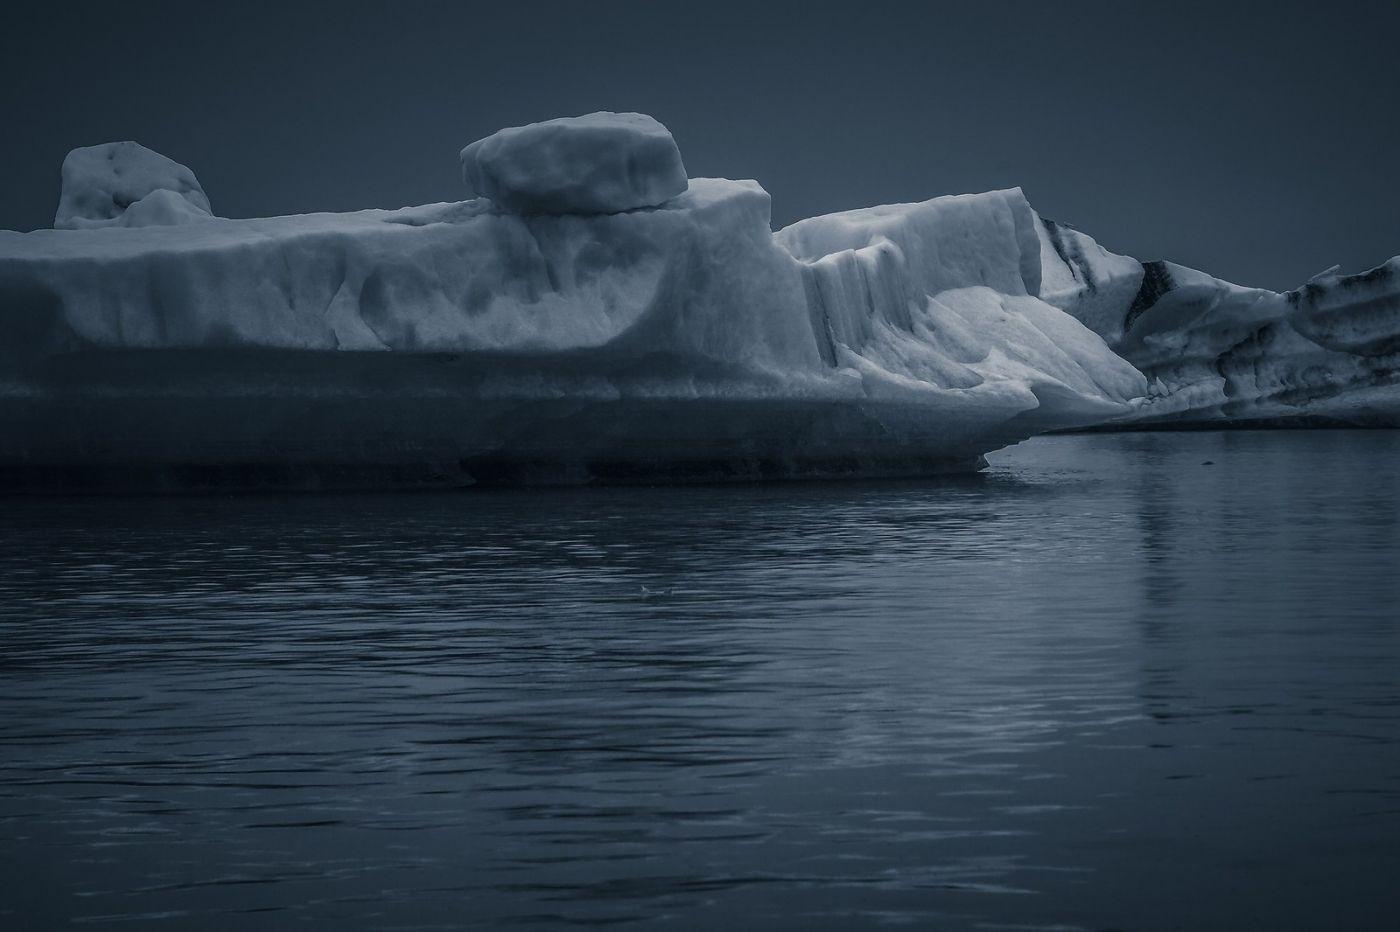 冰岛冰川泻湖(Glacier Lagoon),流动的冰川_图1-15